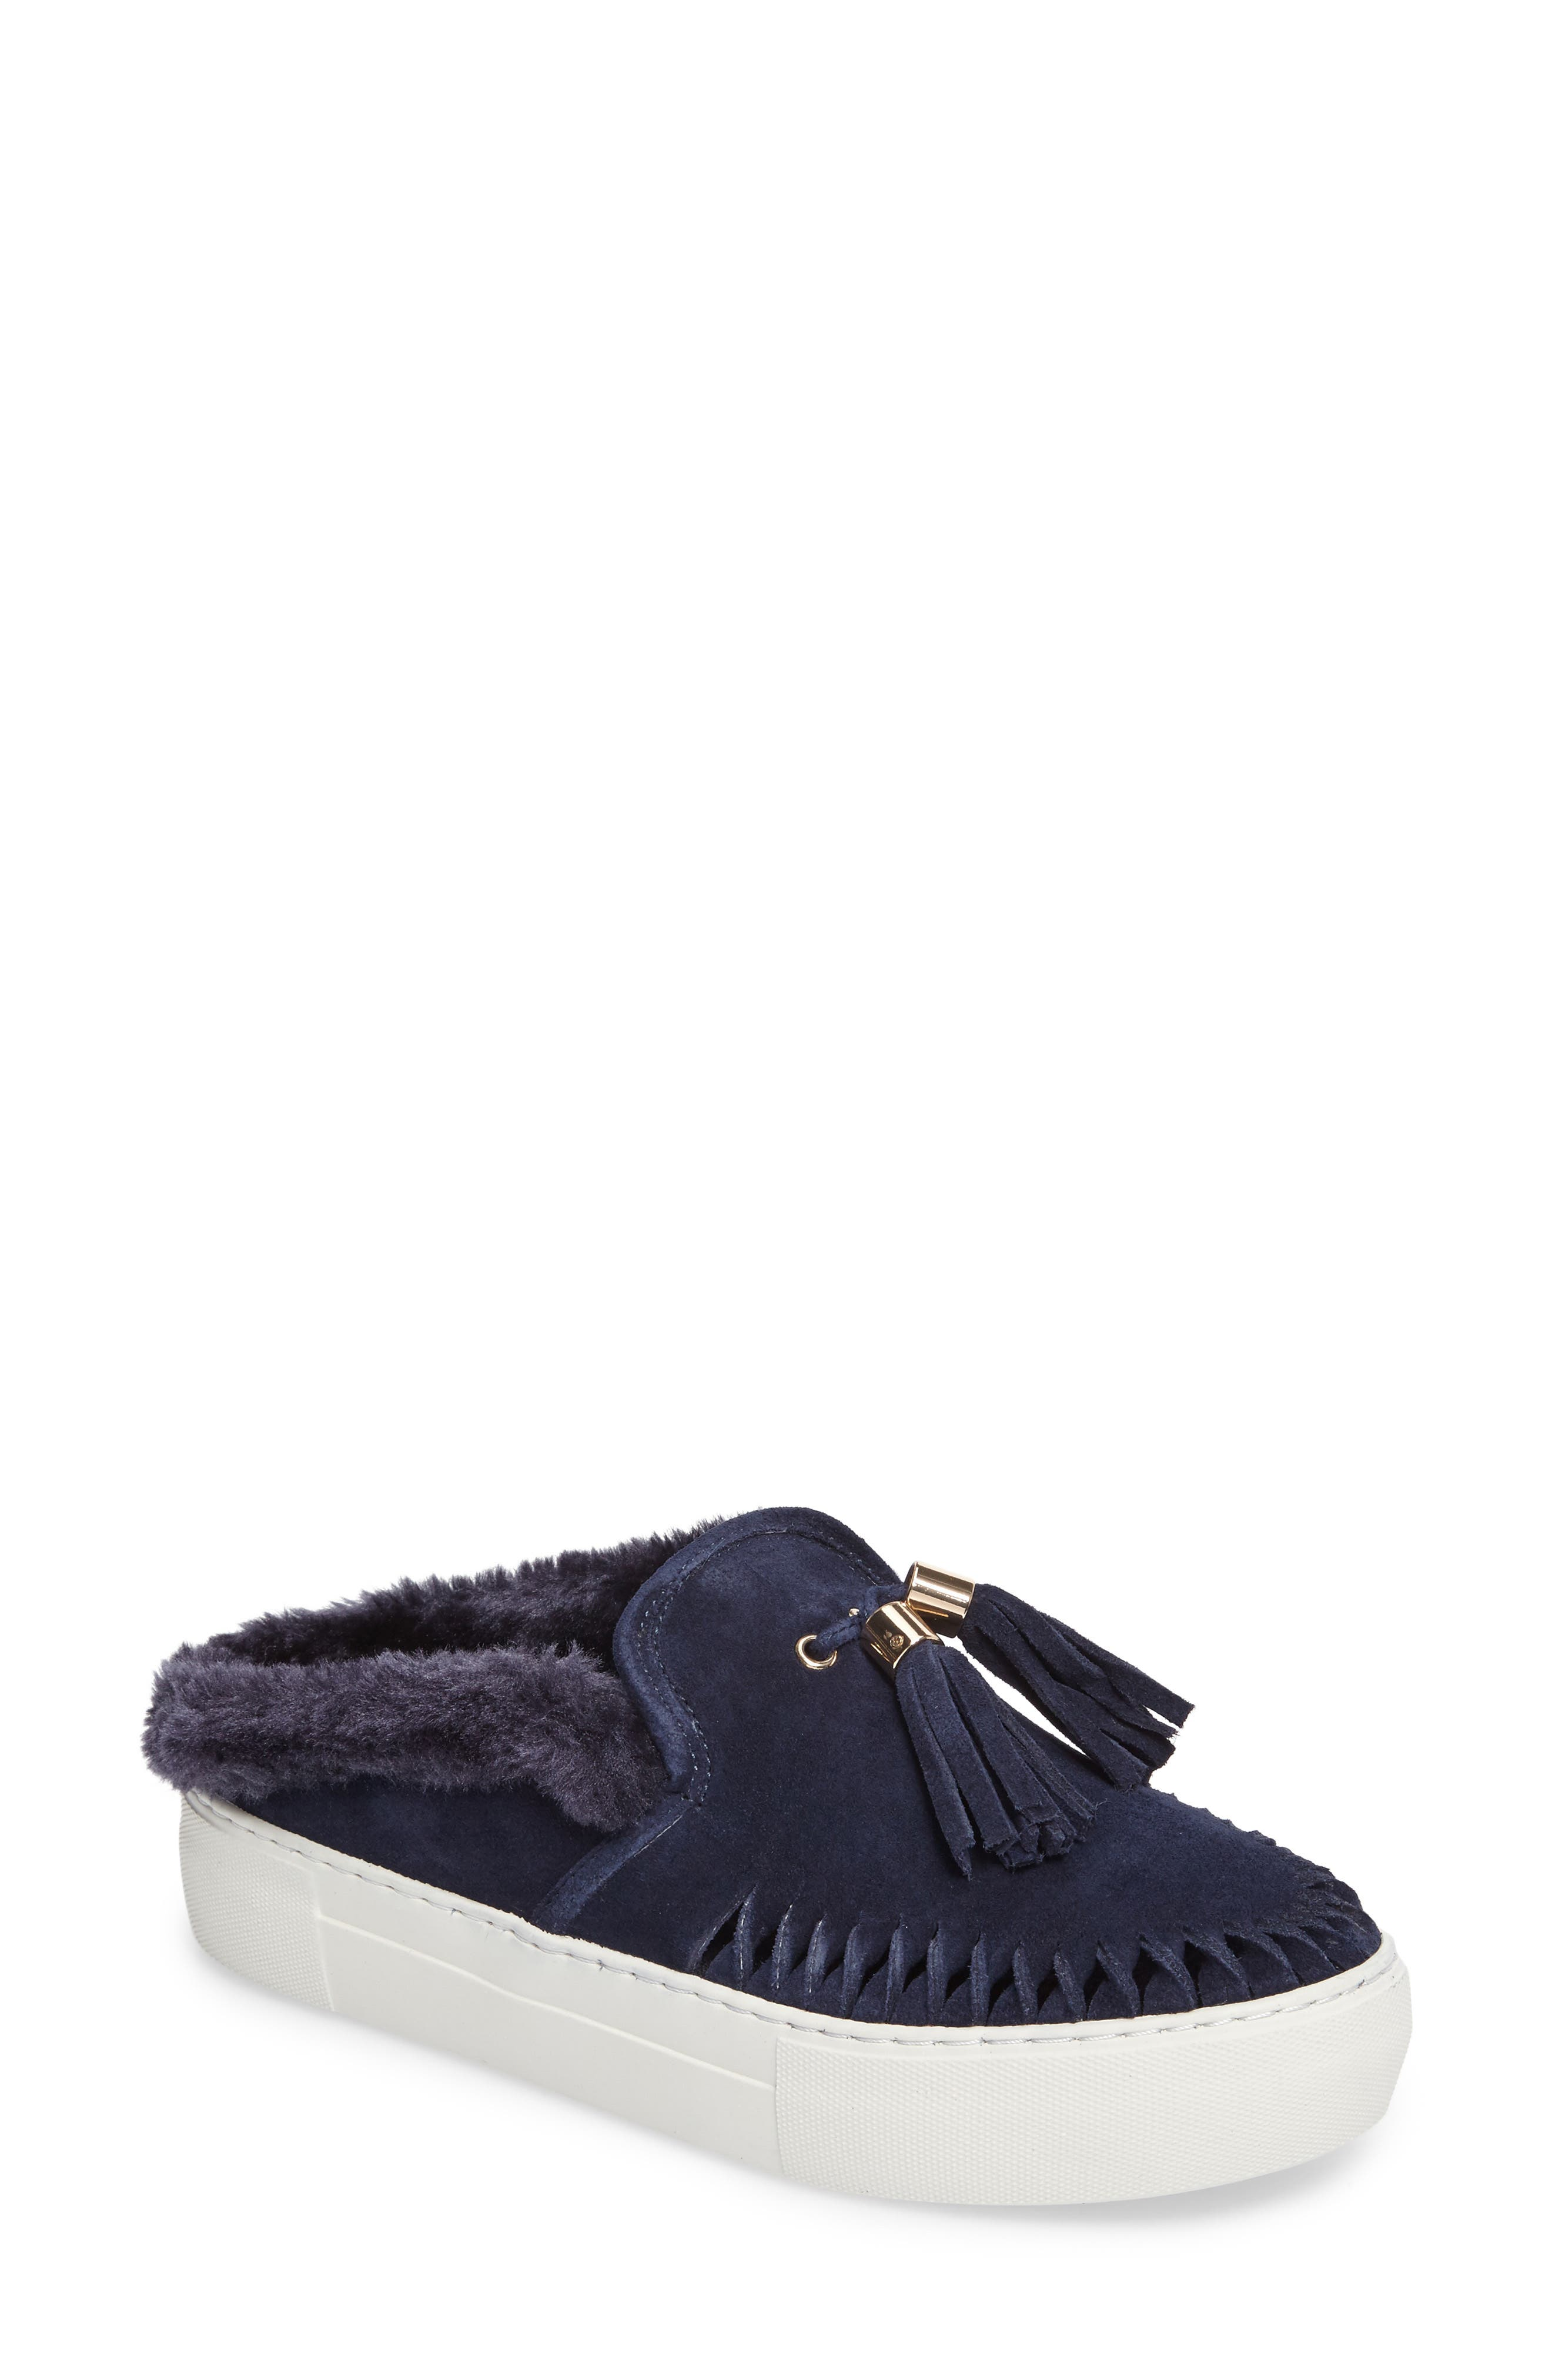 Azul Tassel Slip-On Sneaker,                         Main,                         color, Navy Suede